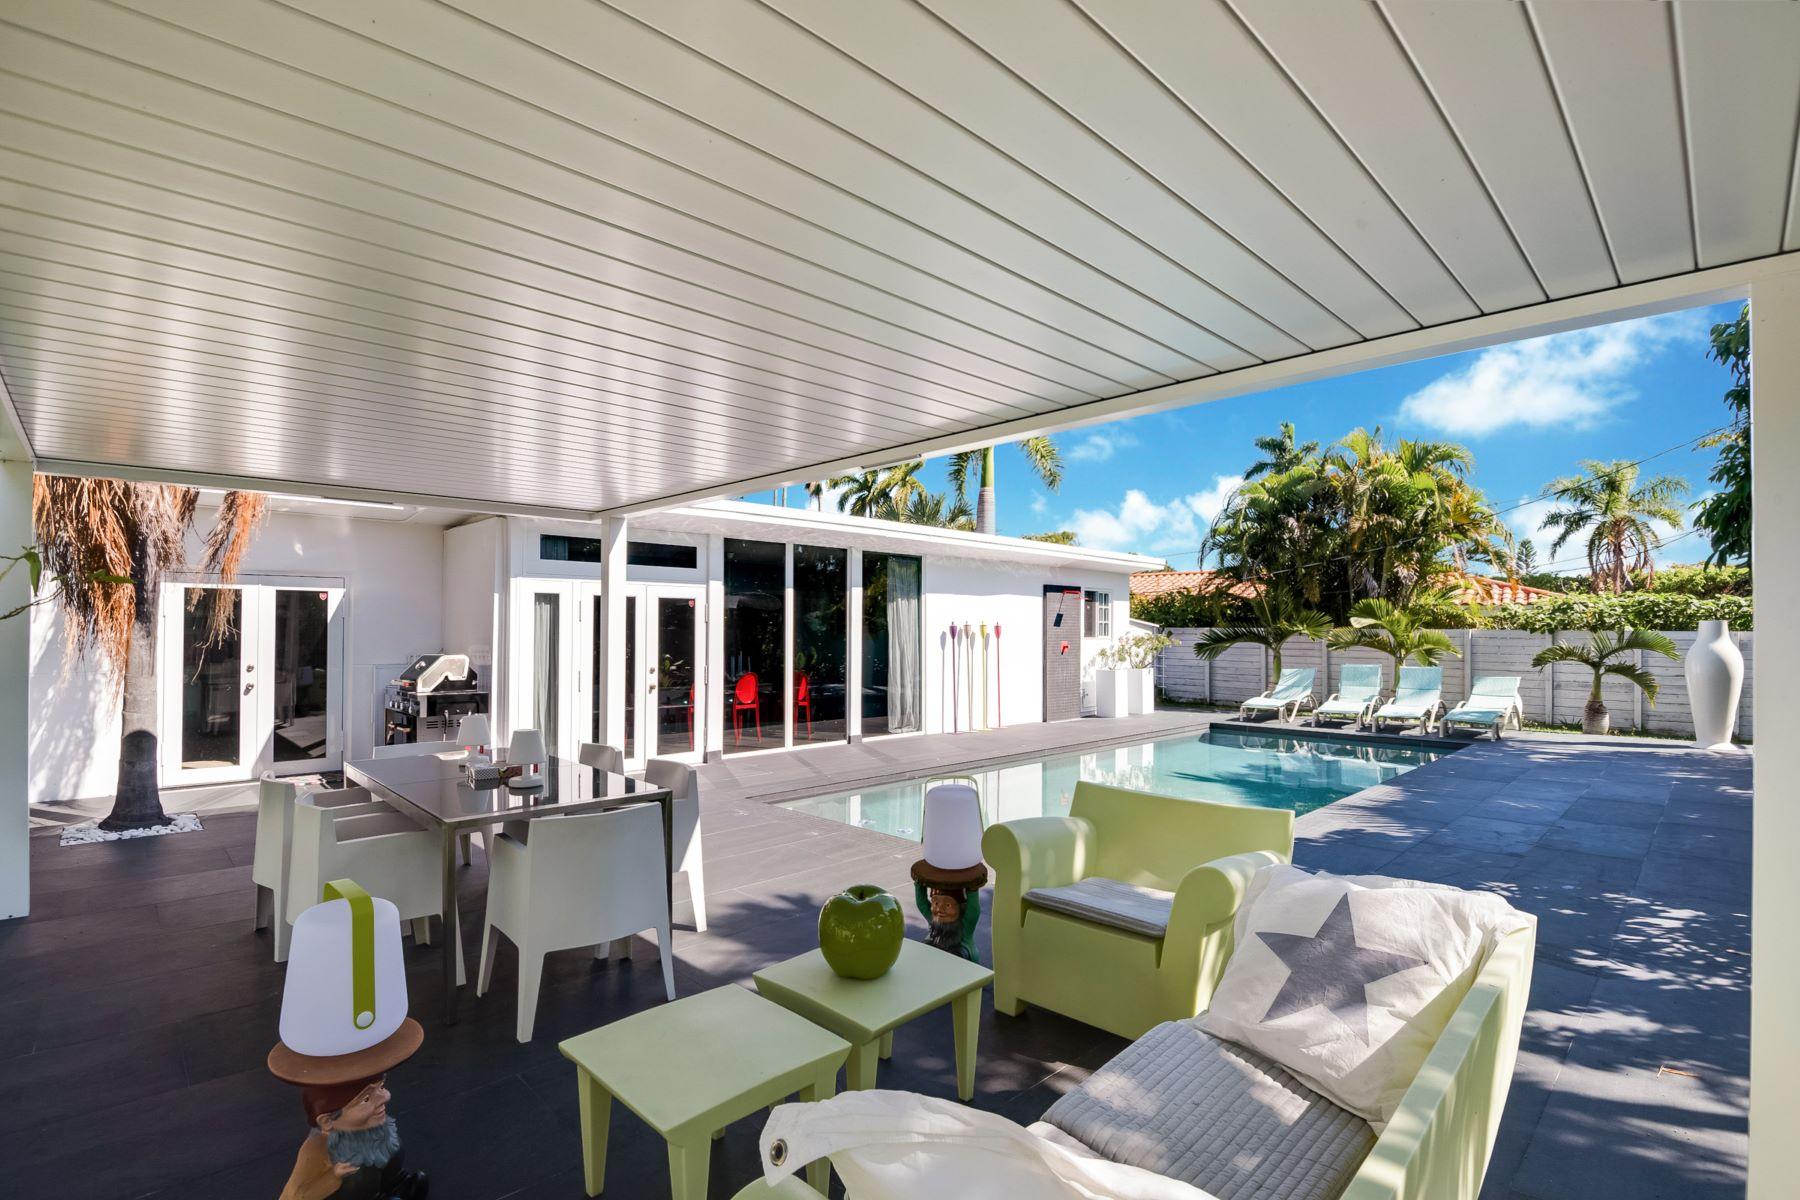 Single Family Homes for Active at 2090 Keystone Blvd North Miami, Florida 33181 United States